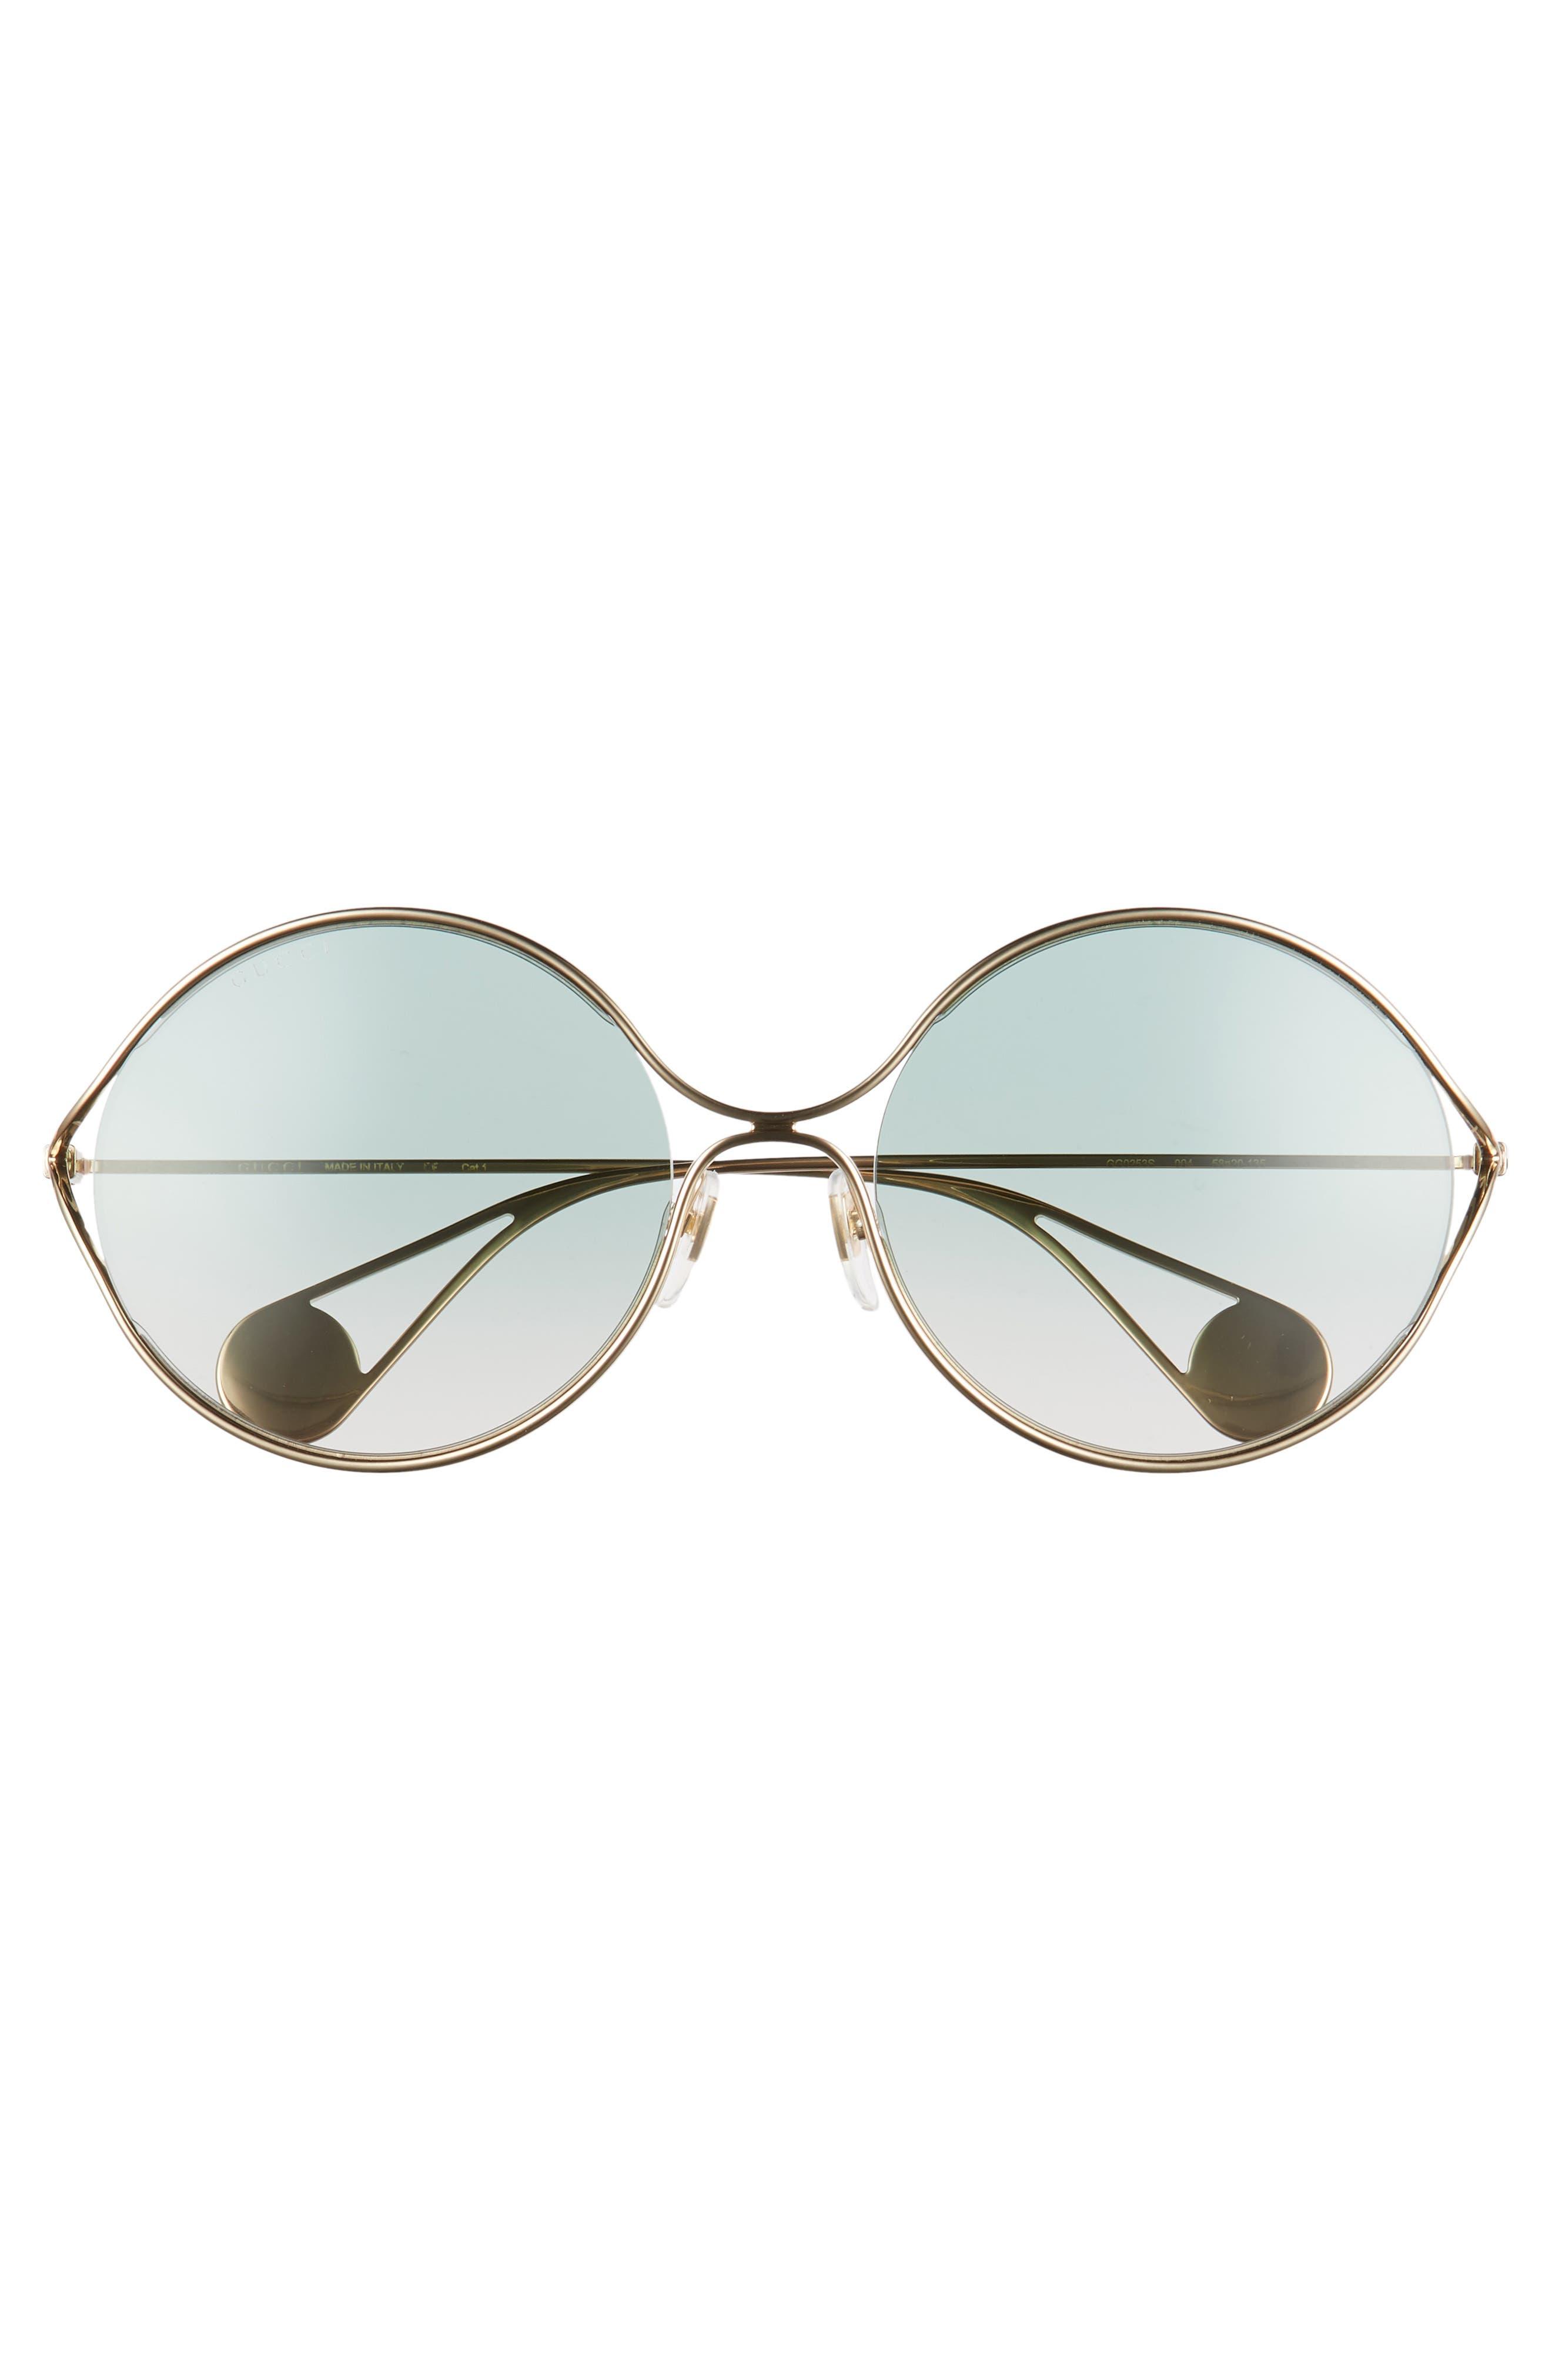 58mm Gradient Lens Round Sunglasses,                             Alternate thumbnail 3, color,                             GOLD/ SAGE/ PINK